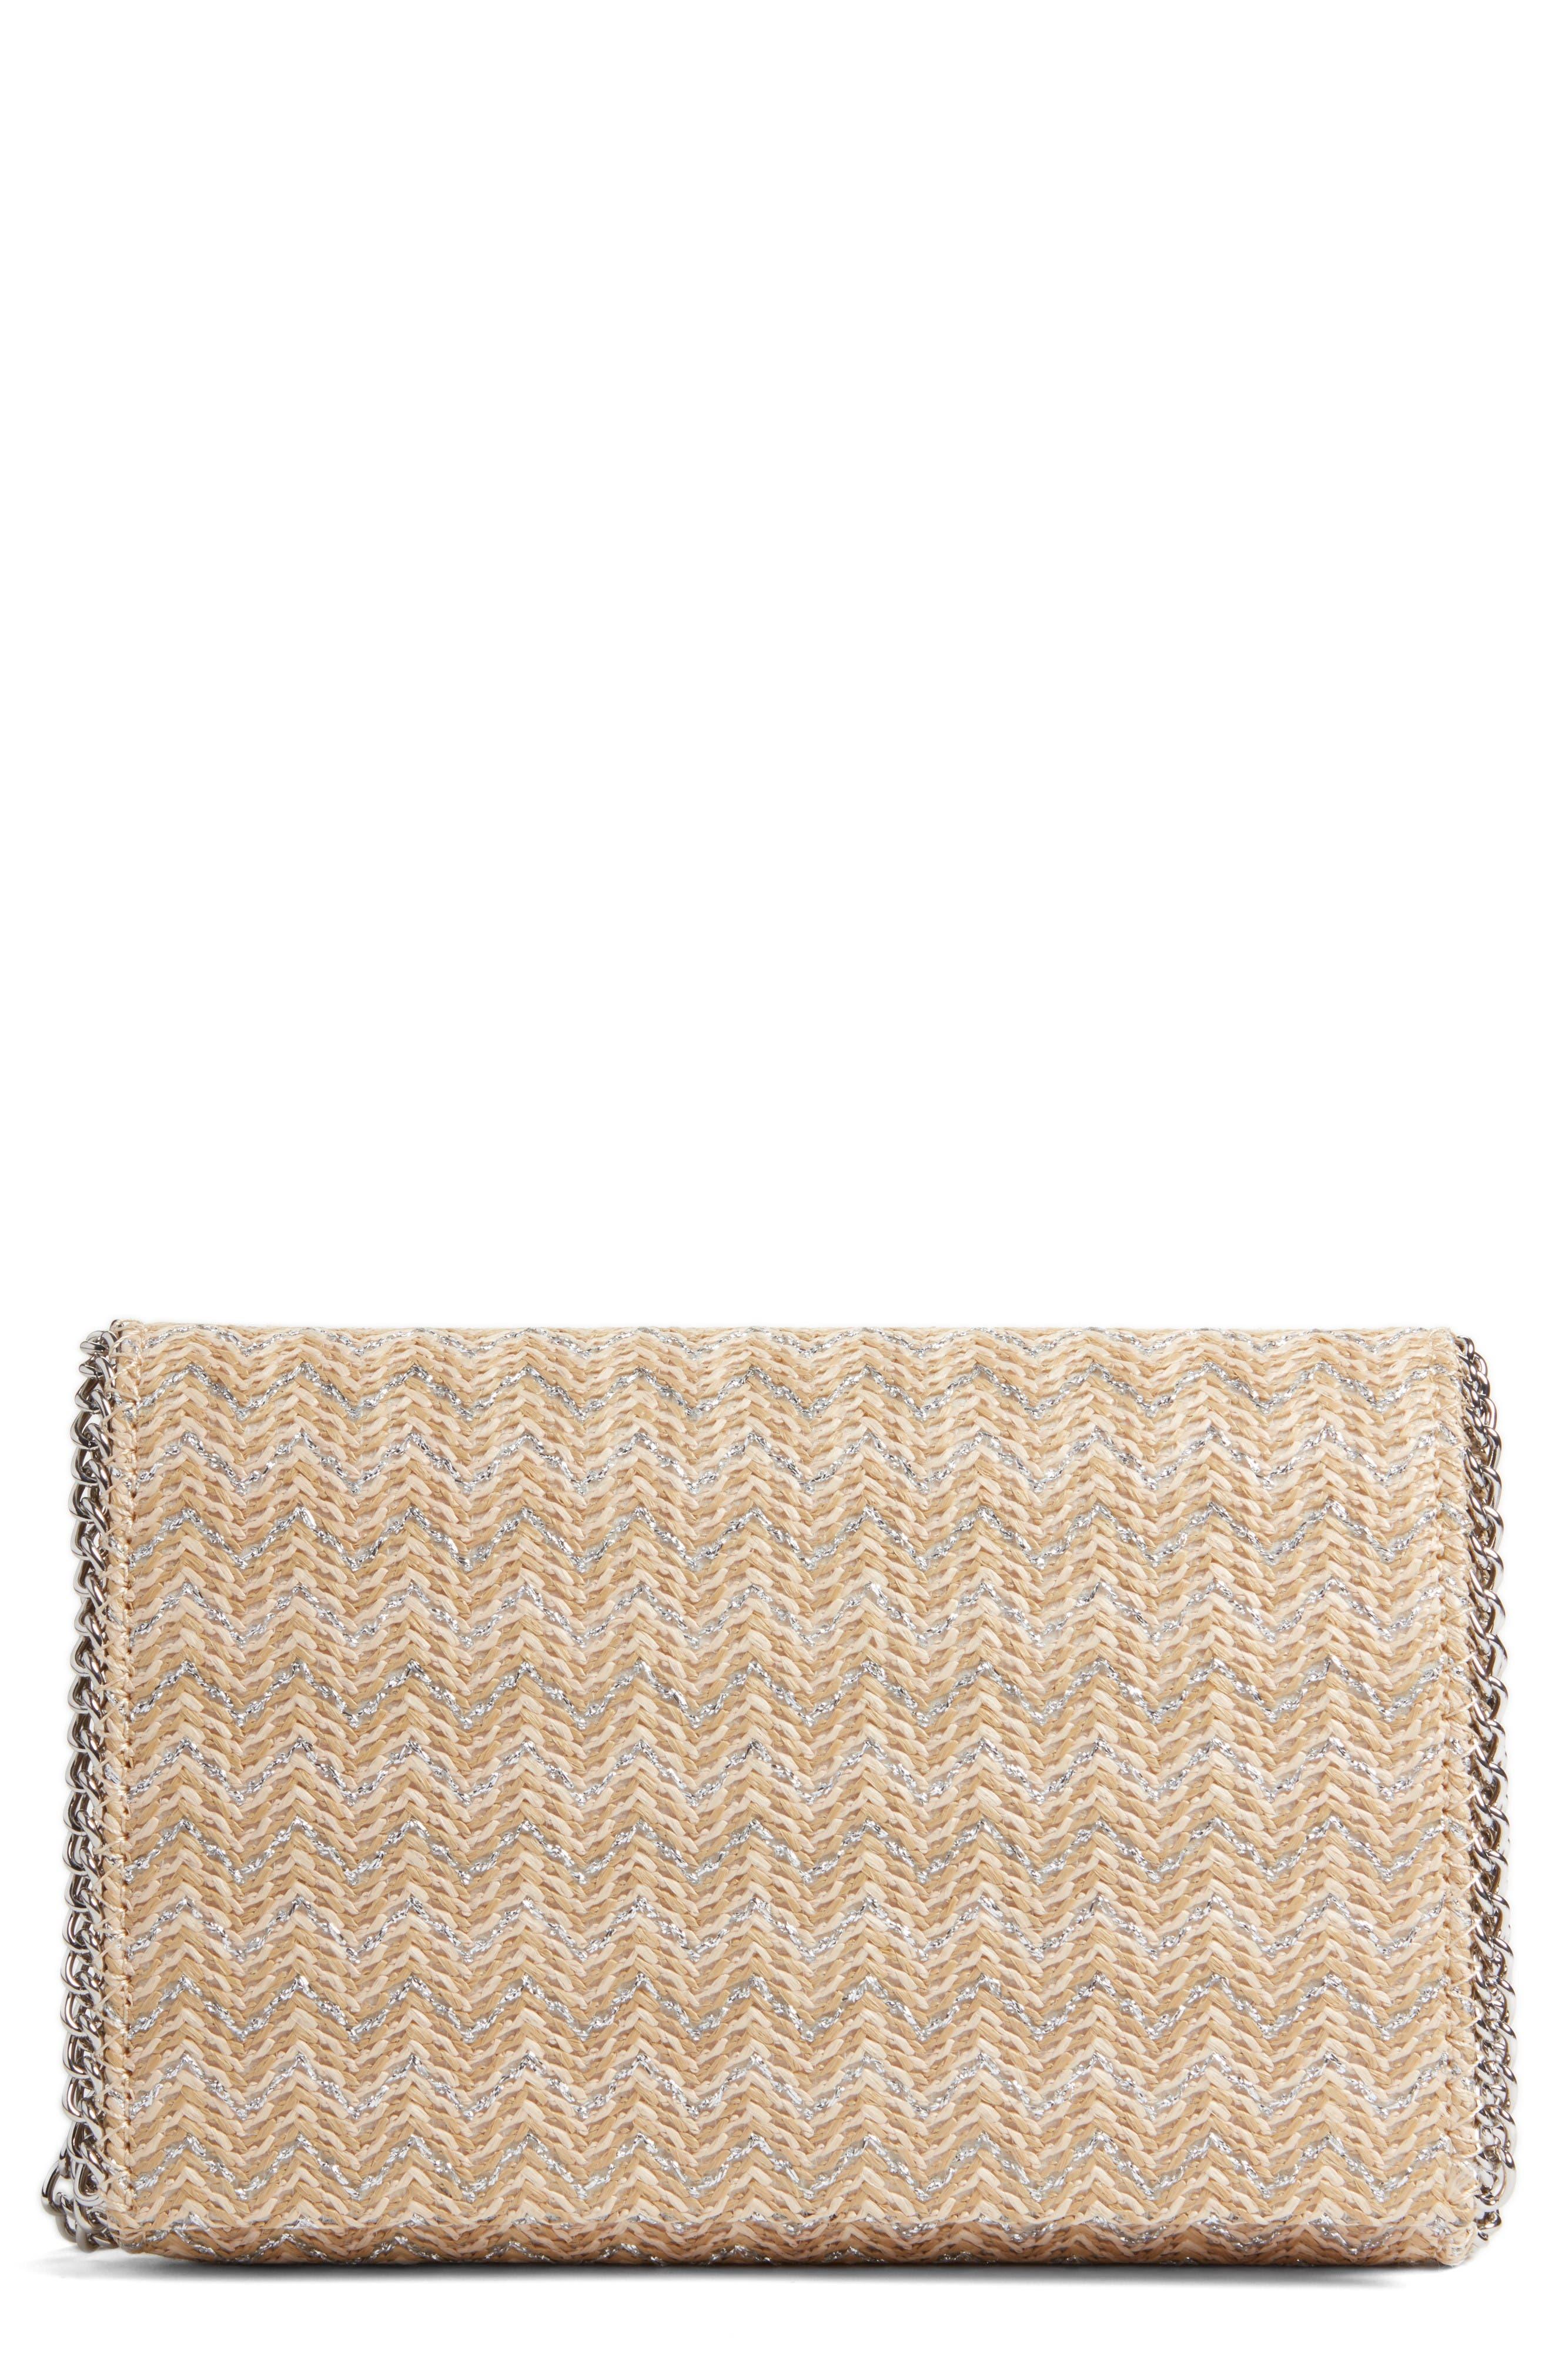 Main Image - Chelsea28 Stripe Straw Convertible Clutch